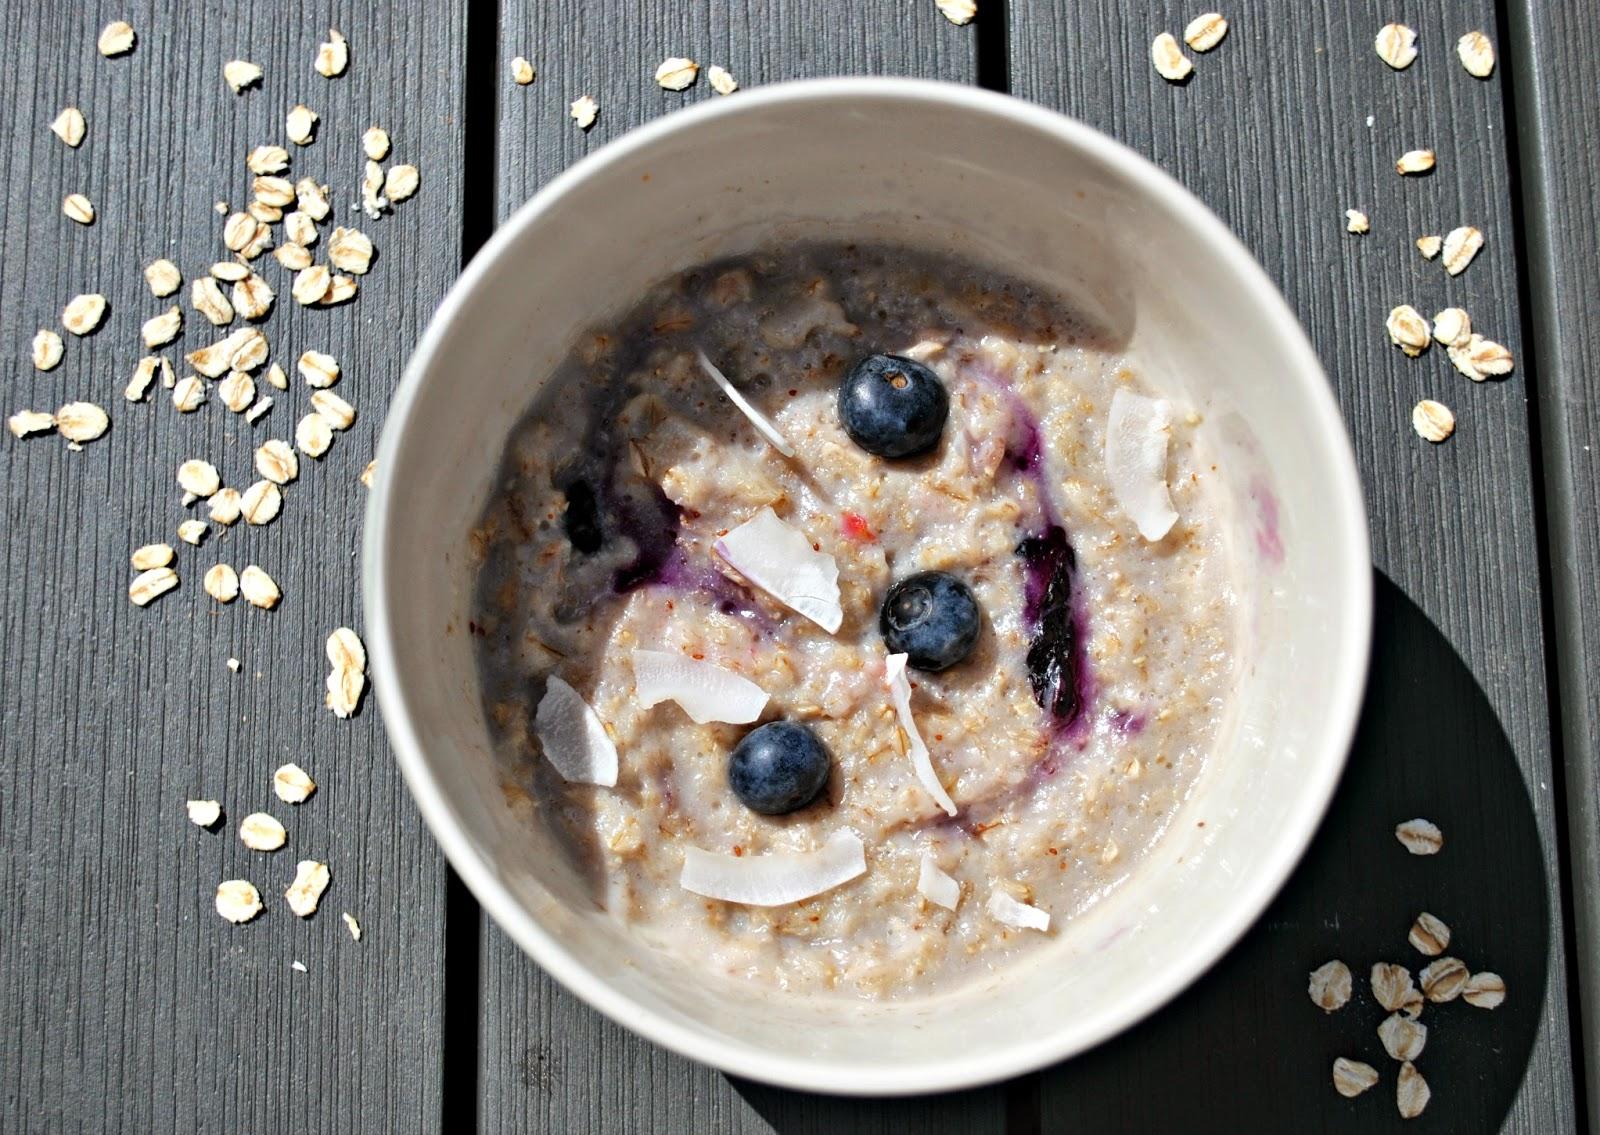 Flahavan's Blueberry Coconut Porridge